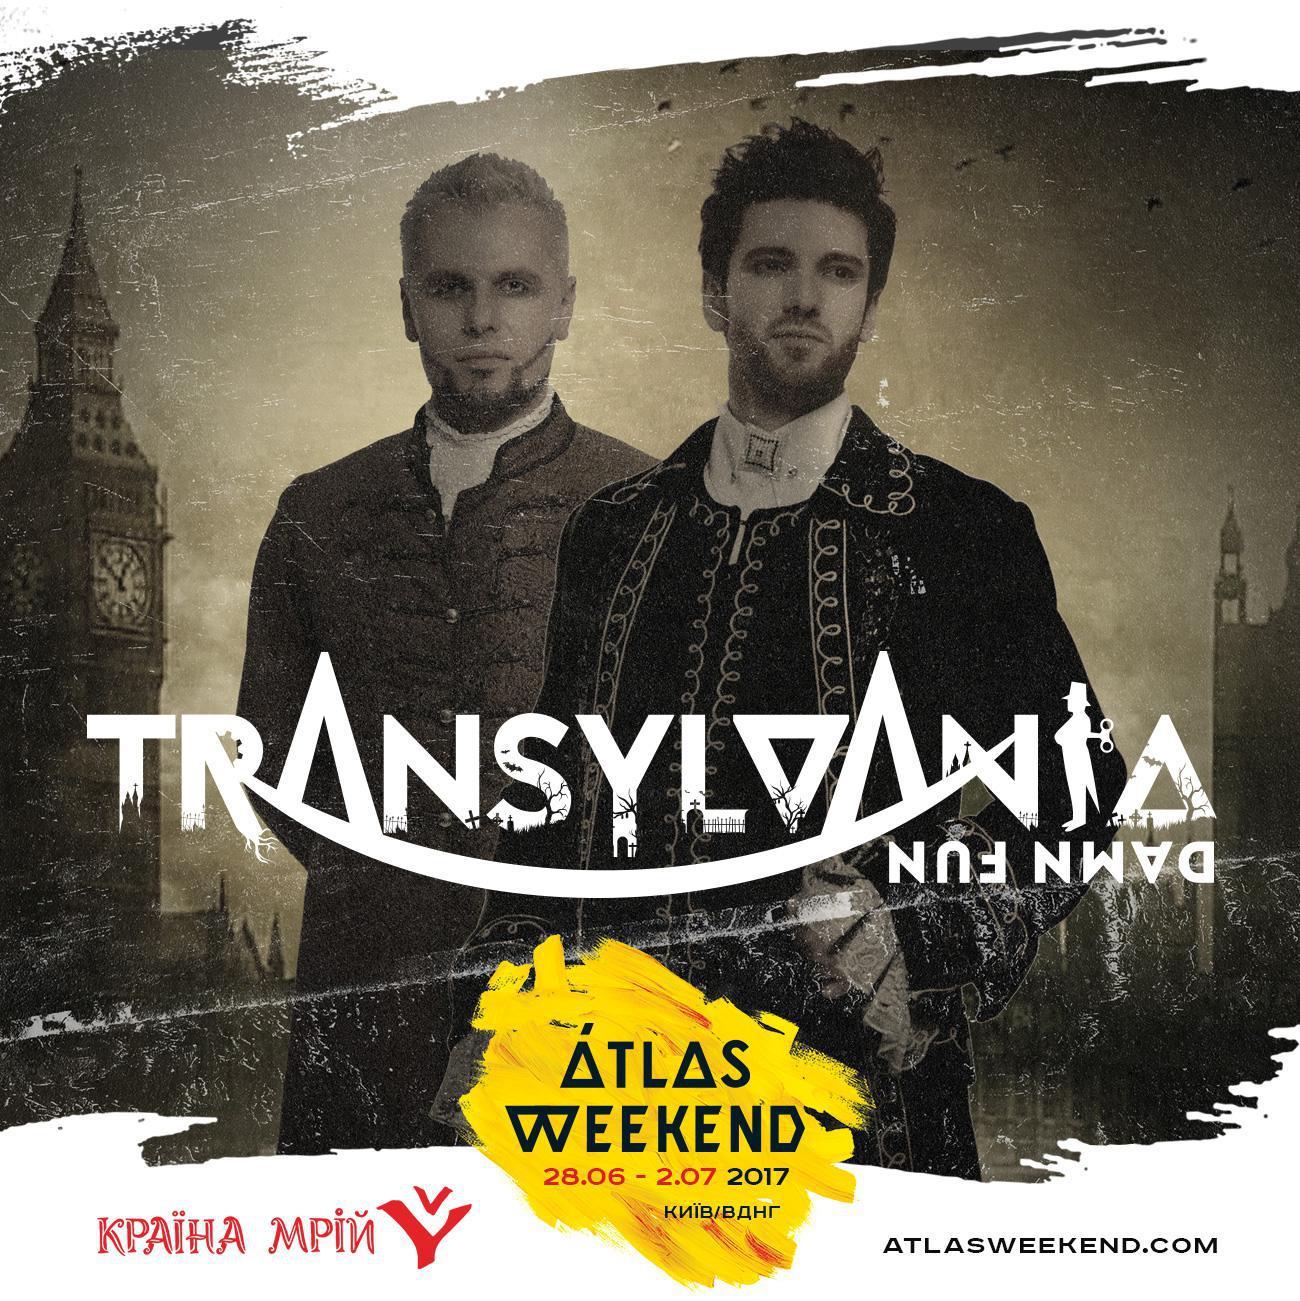 Transylvania Damn Fun